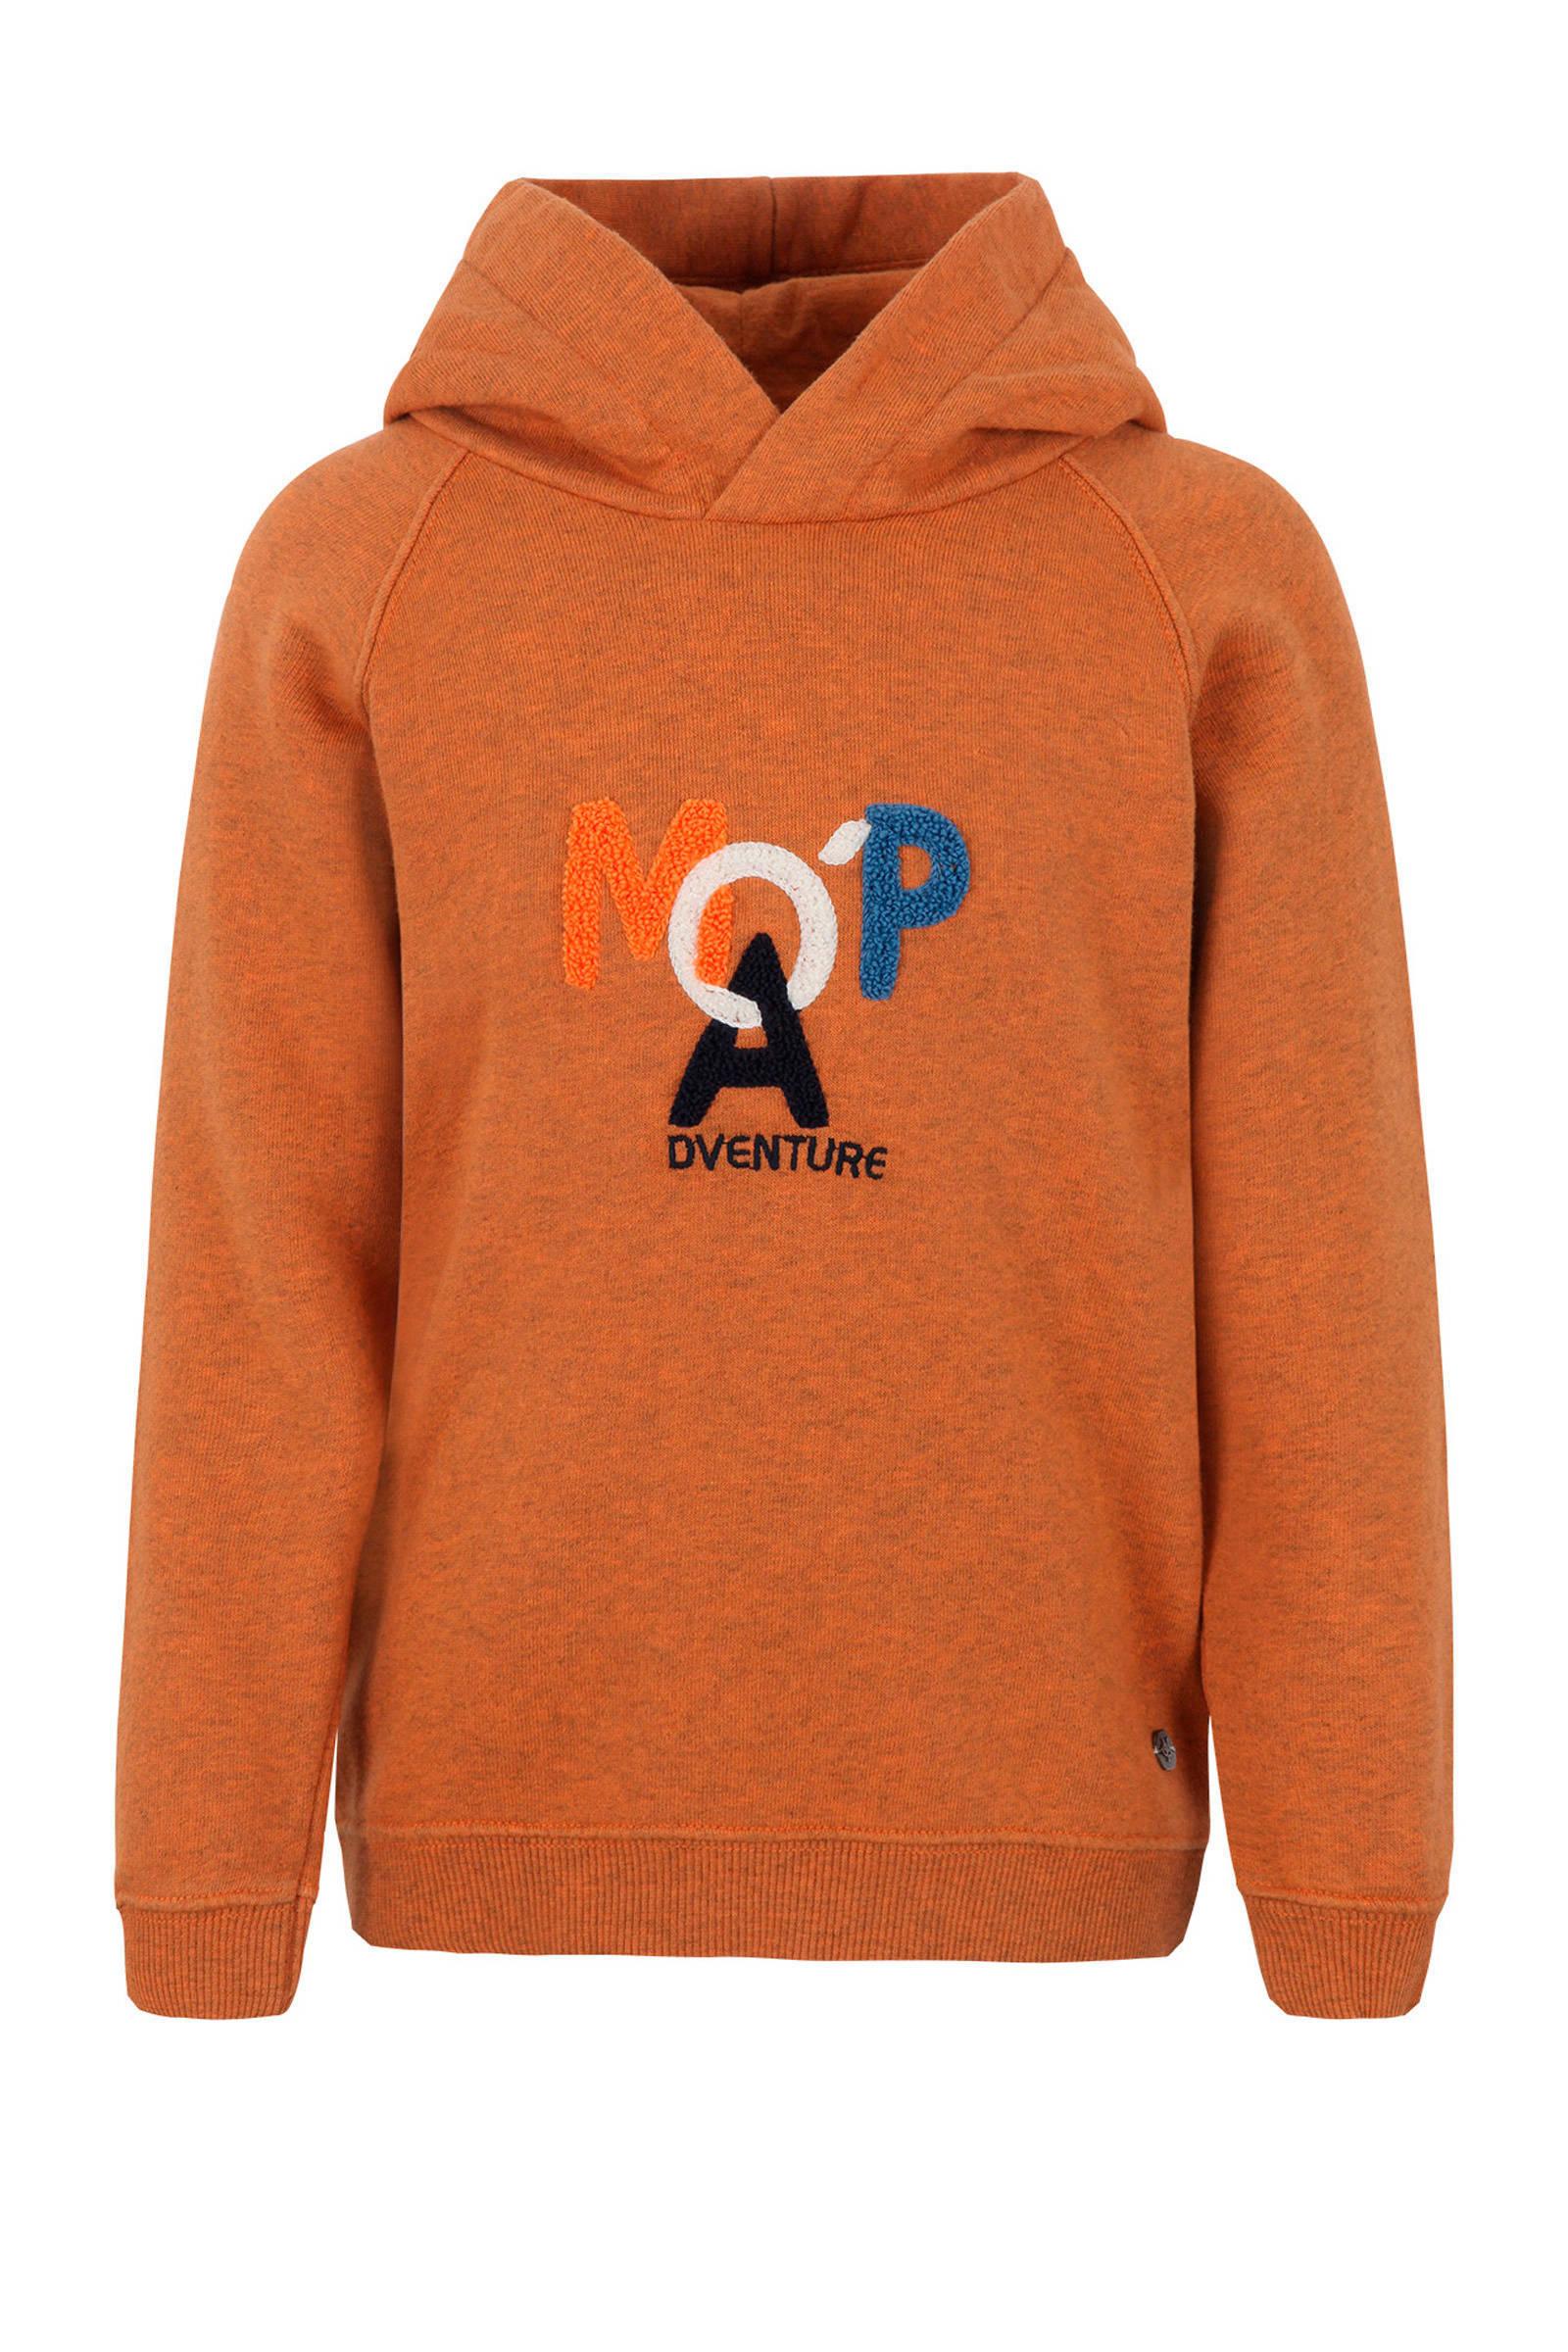 Marc O'Polo hoodie oranje (jongens)